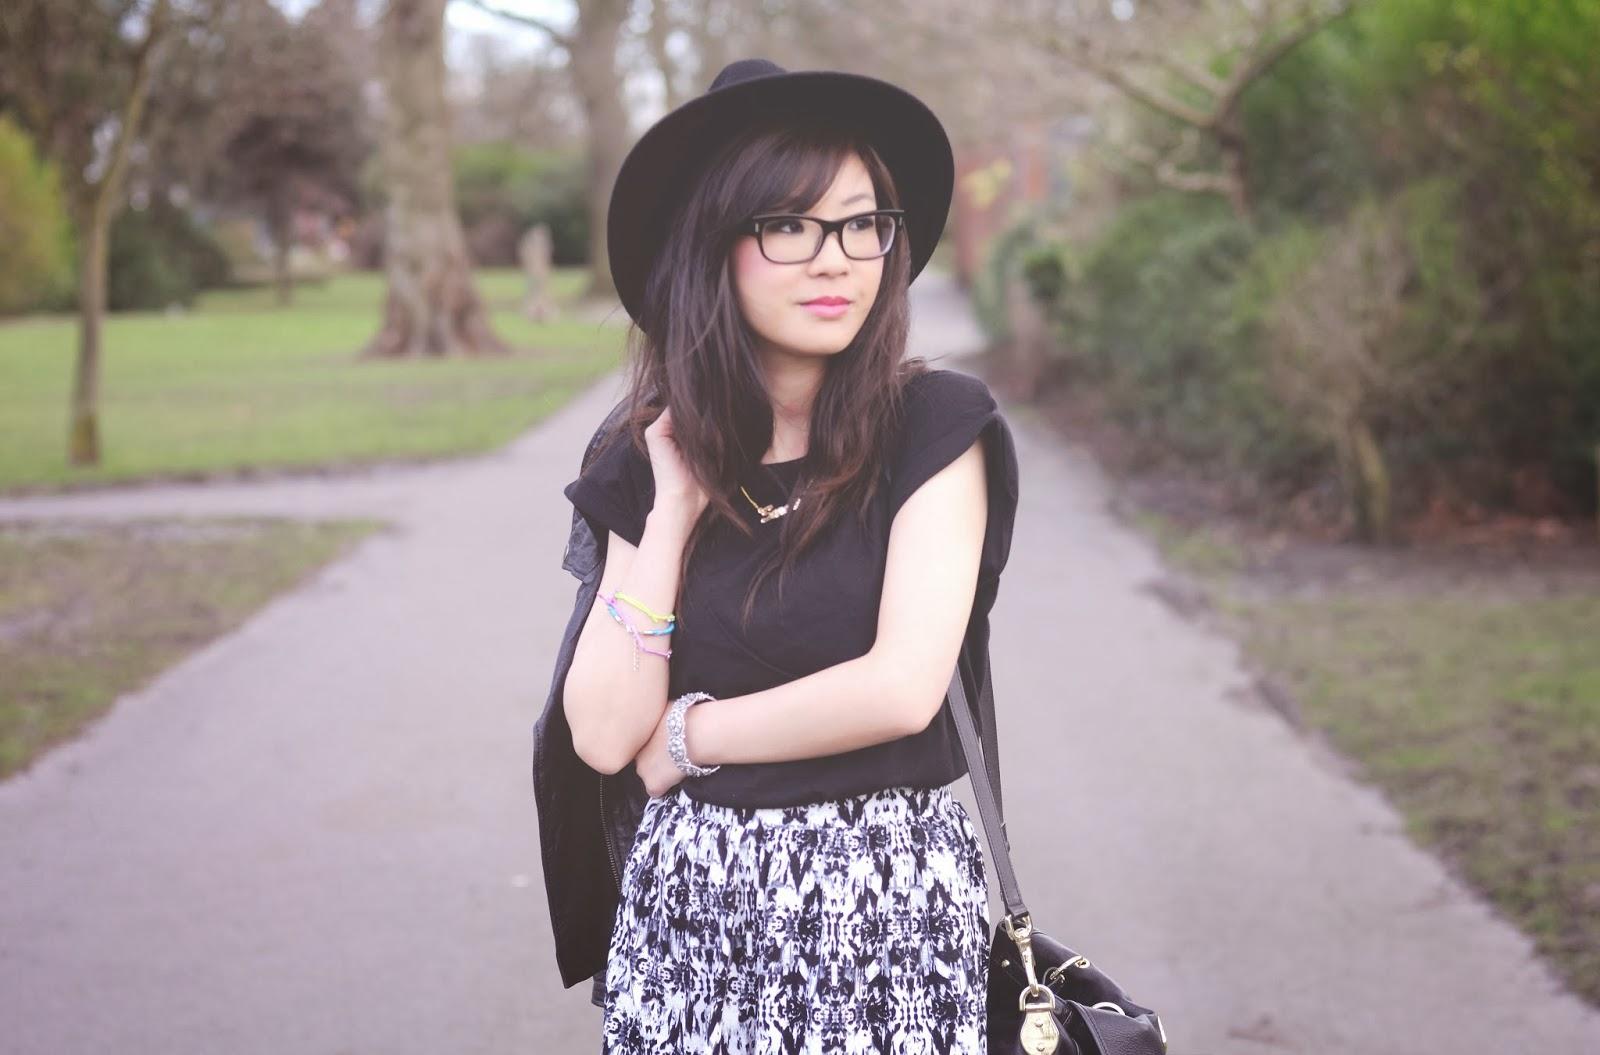 Fashion Blog UK, How to style black and white shorts, ways to wear monochrome